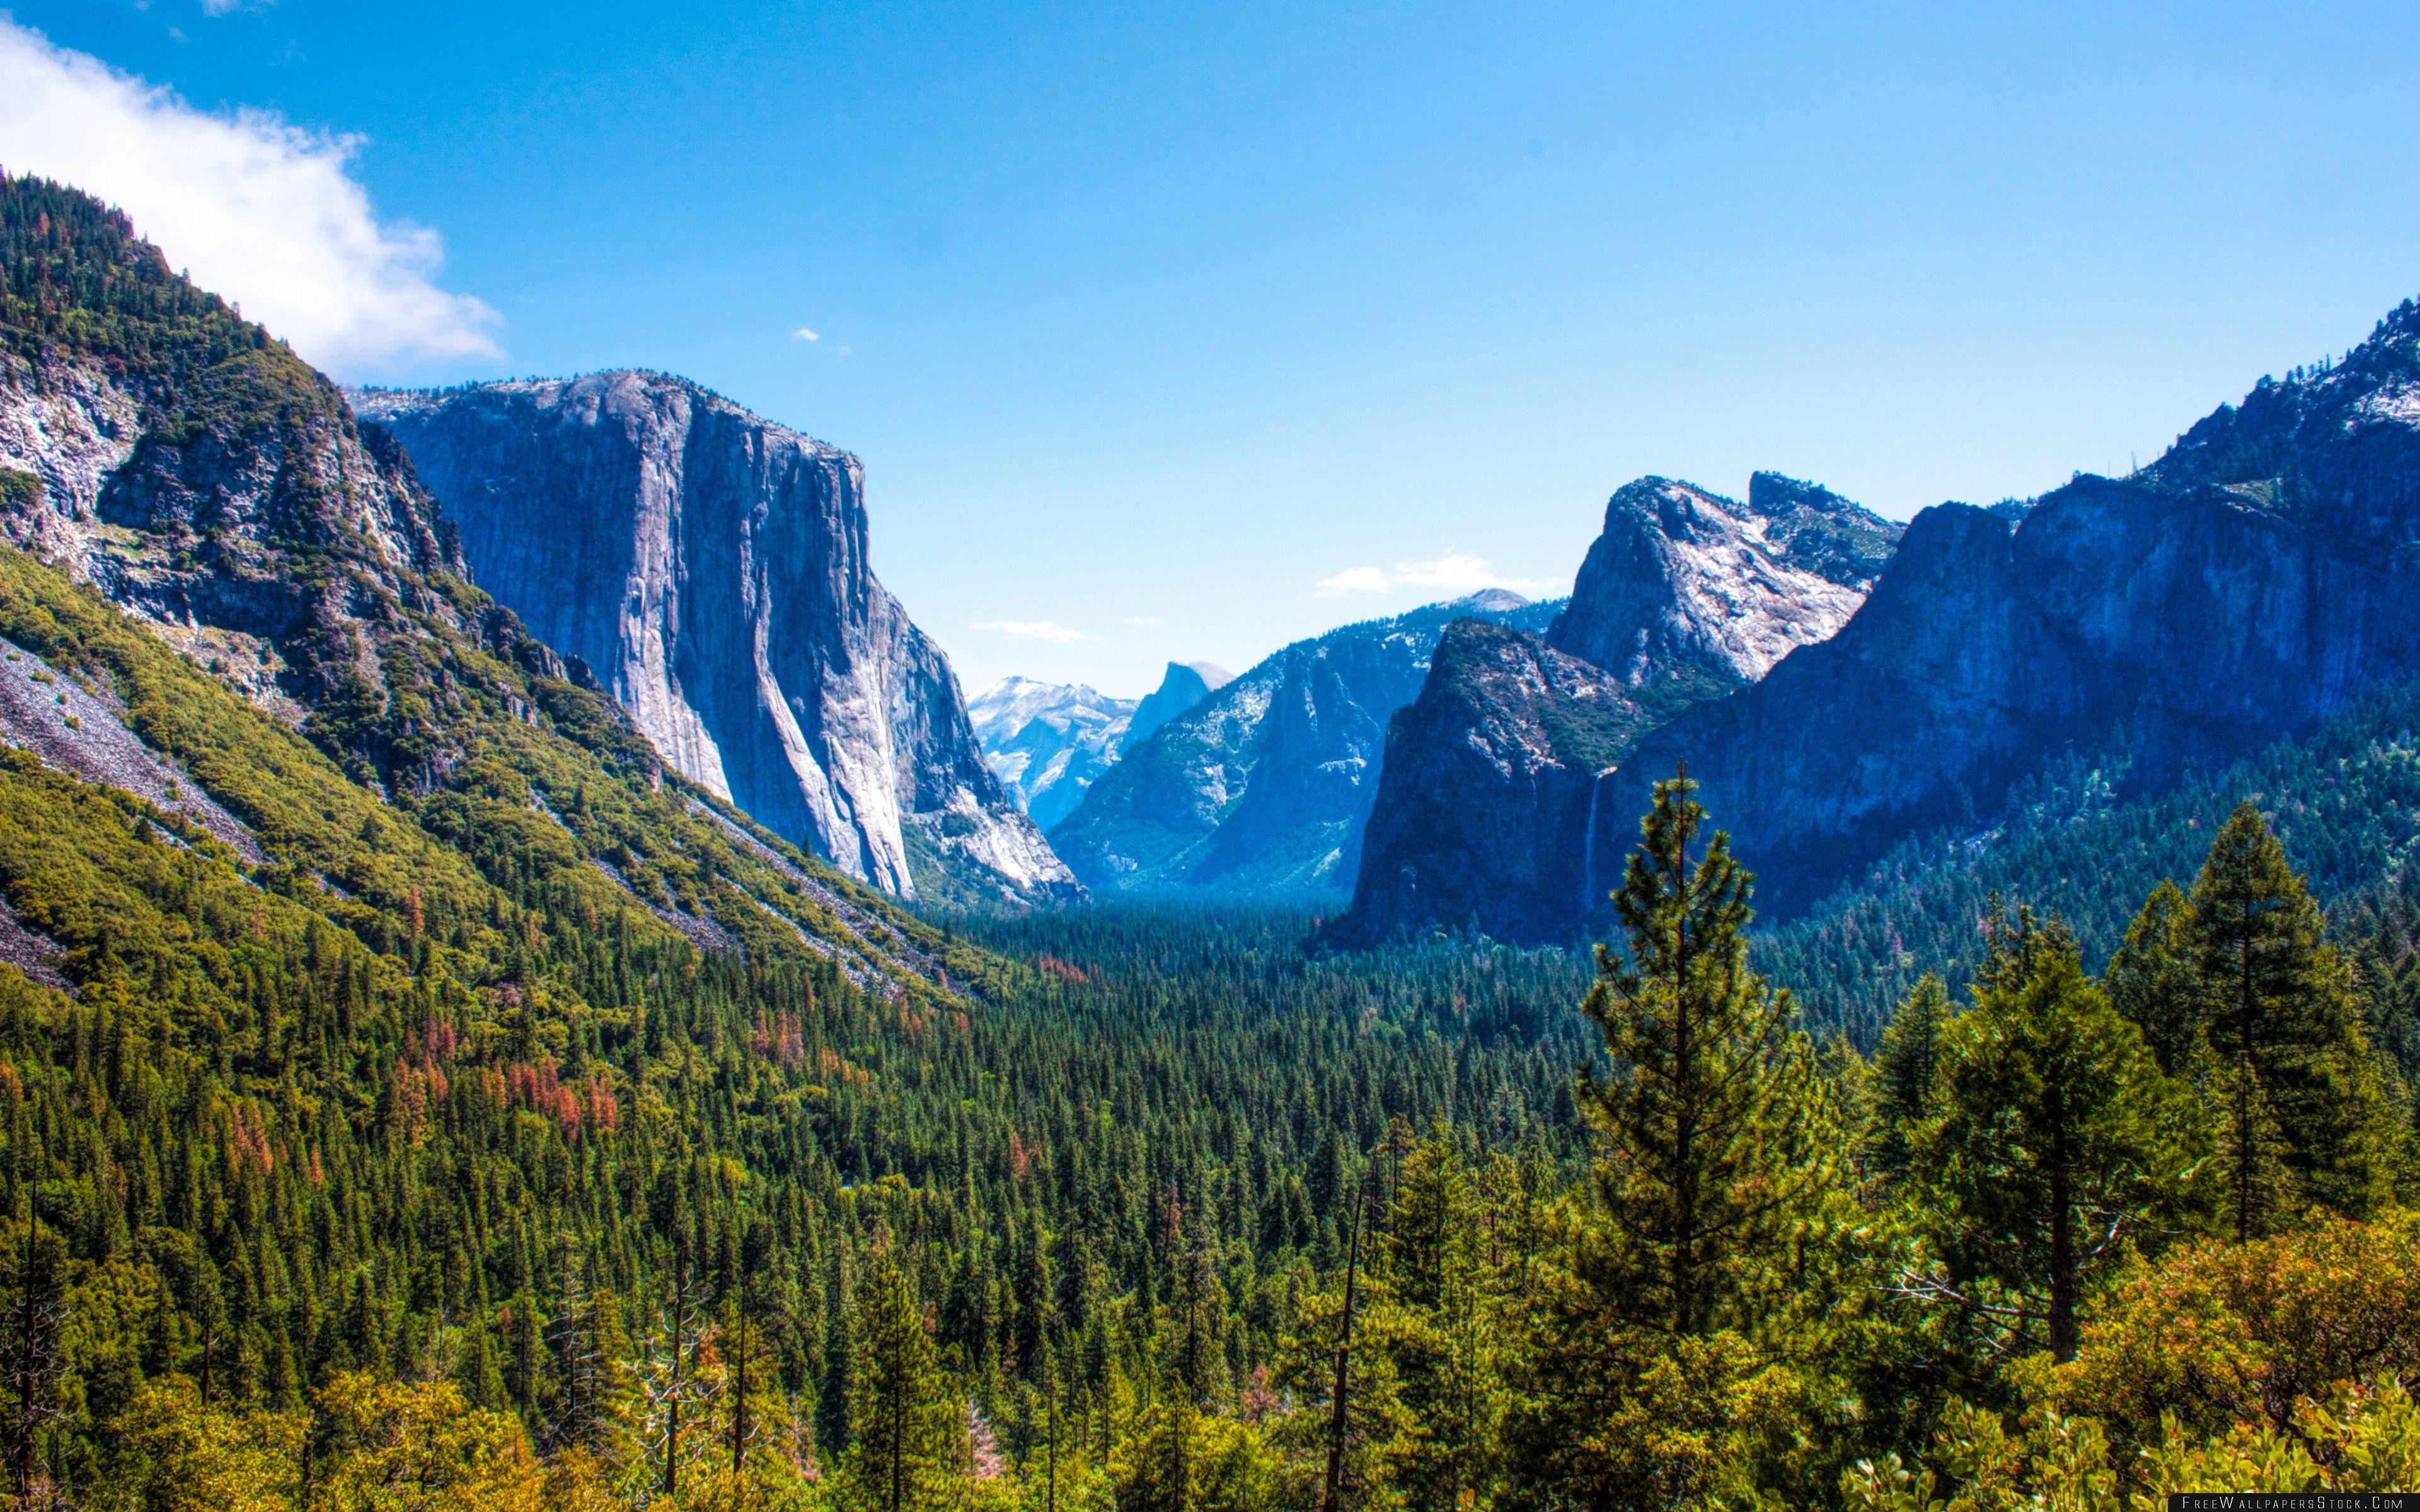 Download Free Wallpaper Yosemite National Park Valley